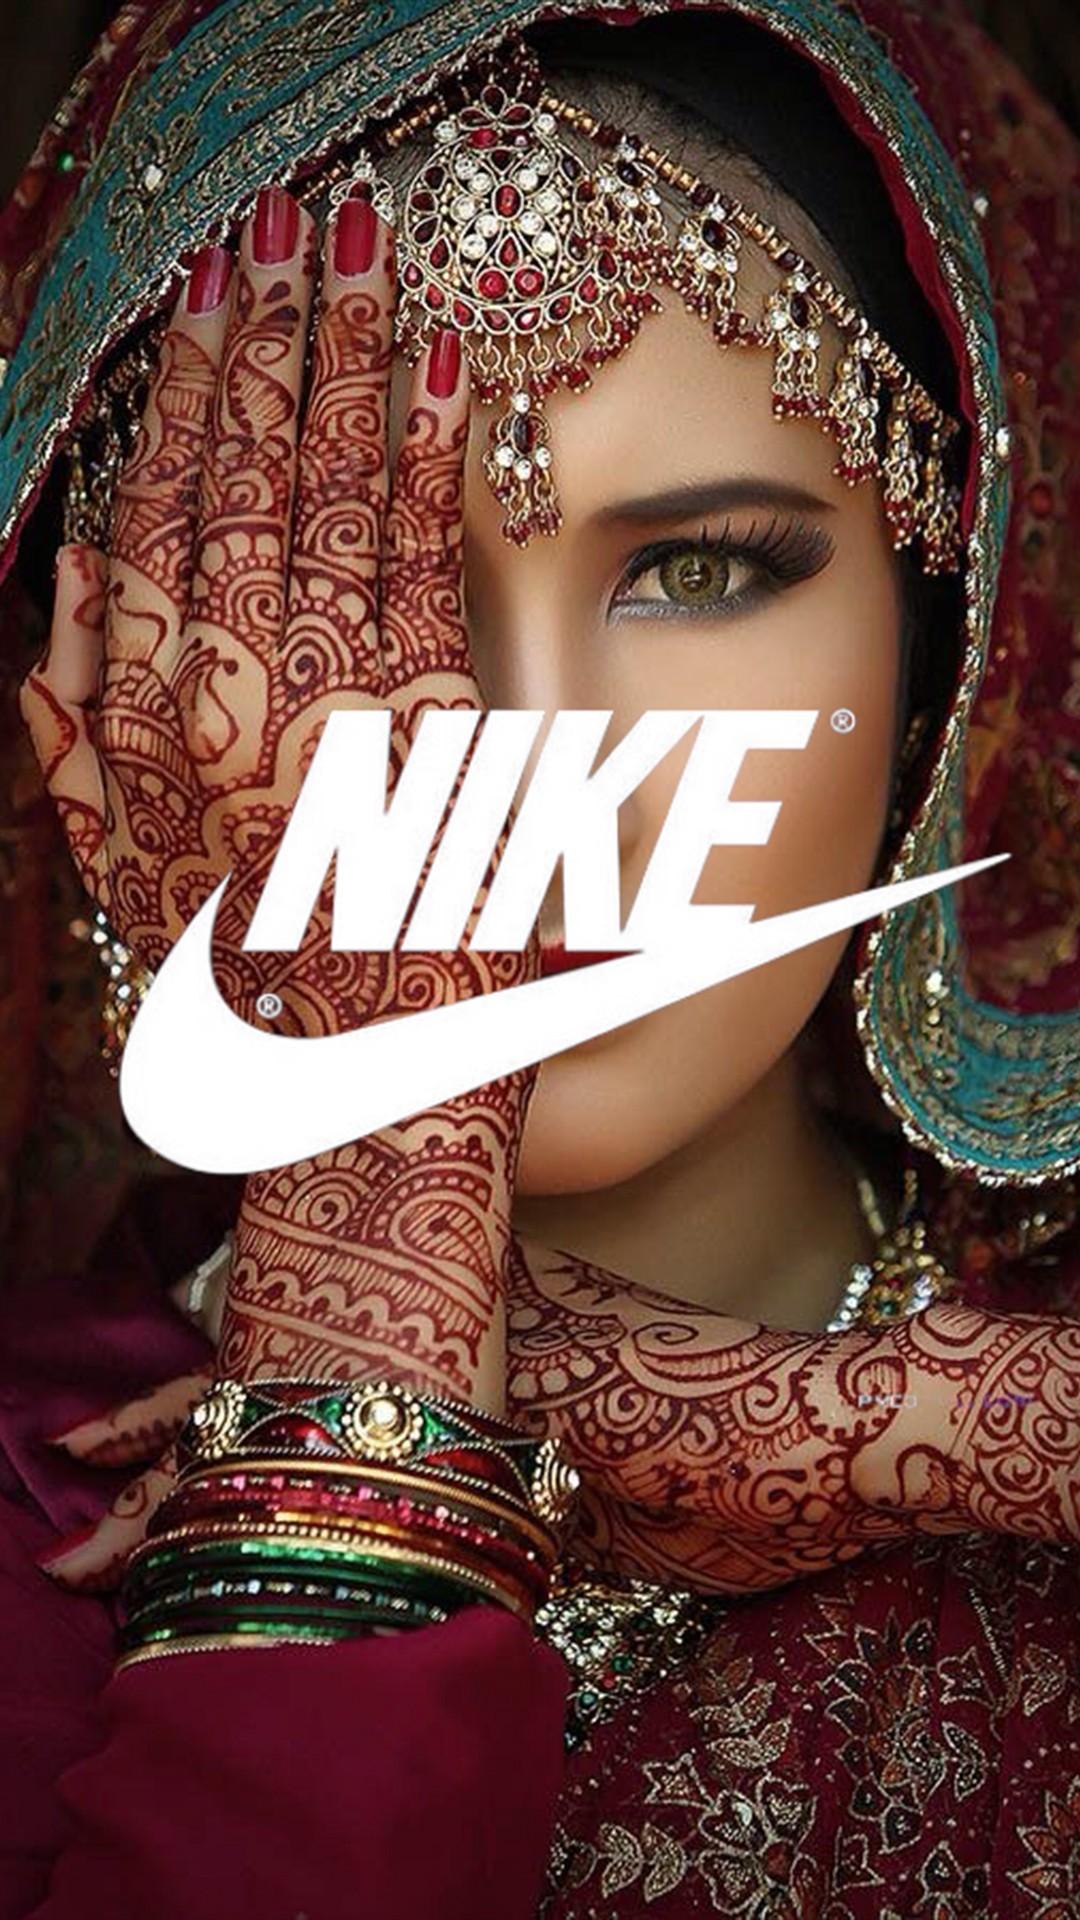 Nike Indian Girl Wallpaper – Nike Indian Girl iPhone 6 Plus Wallpaper…